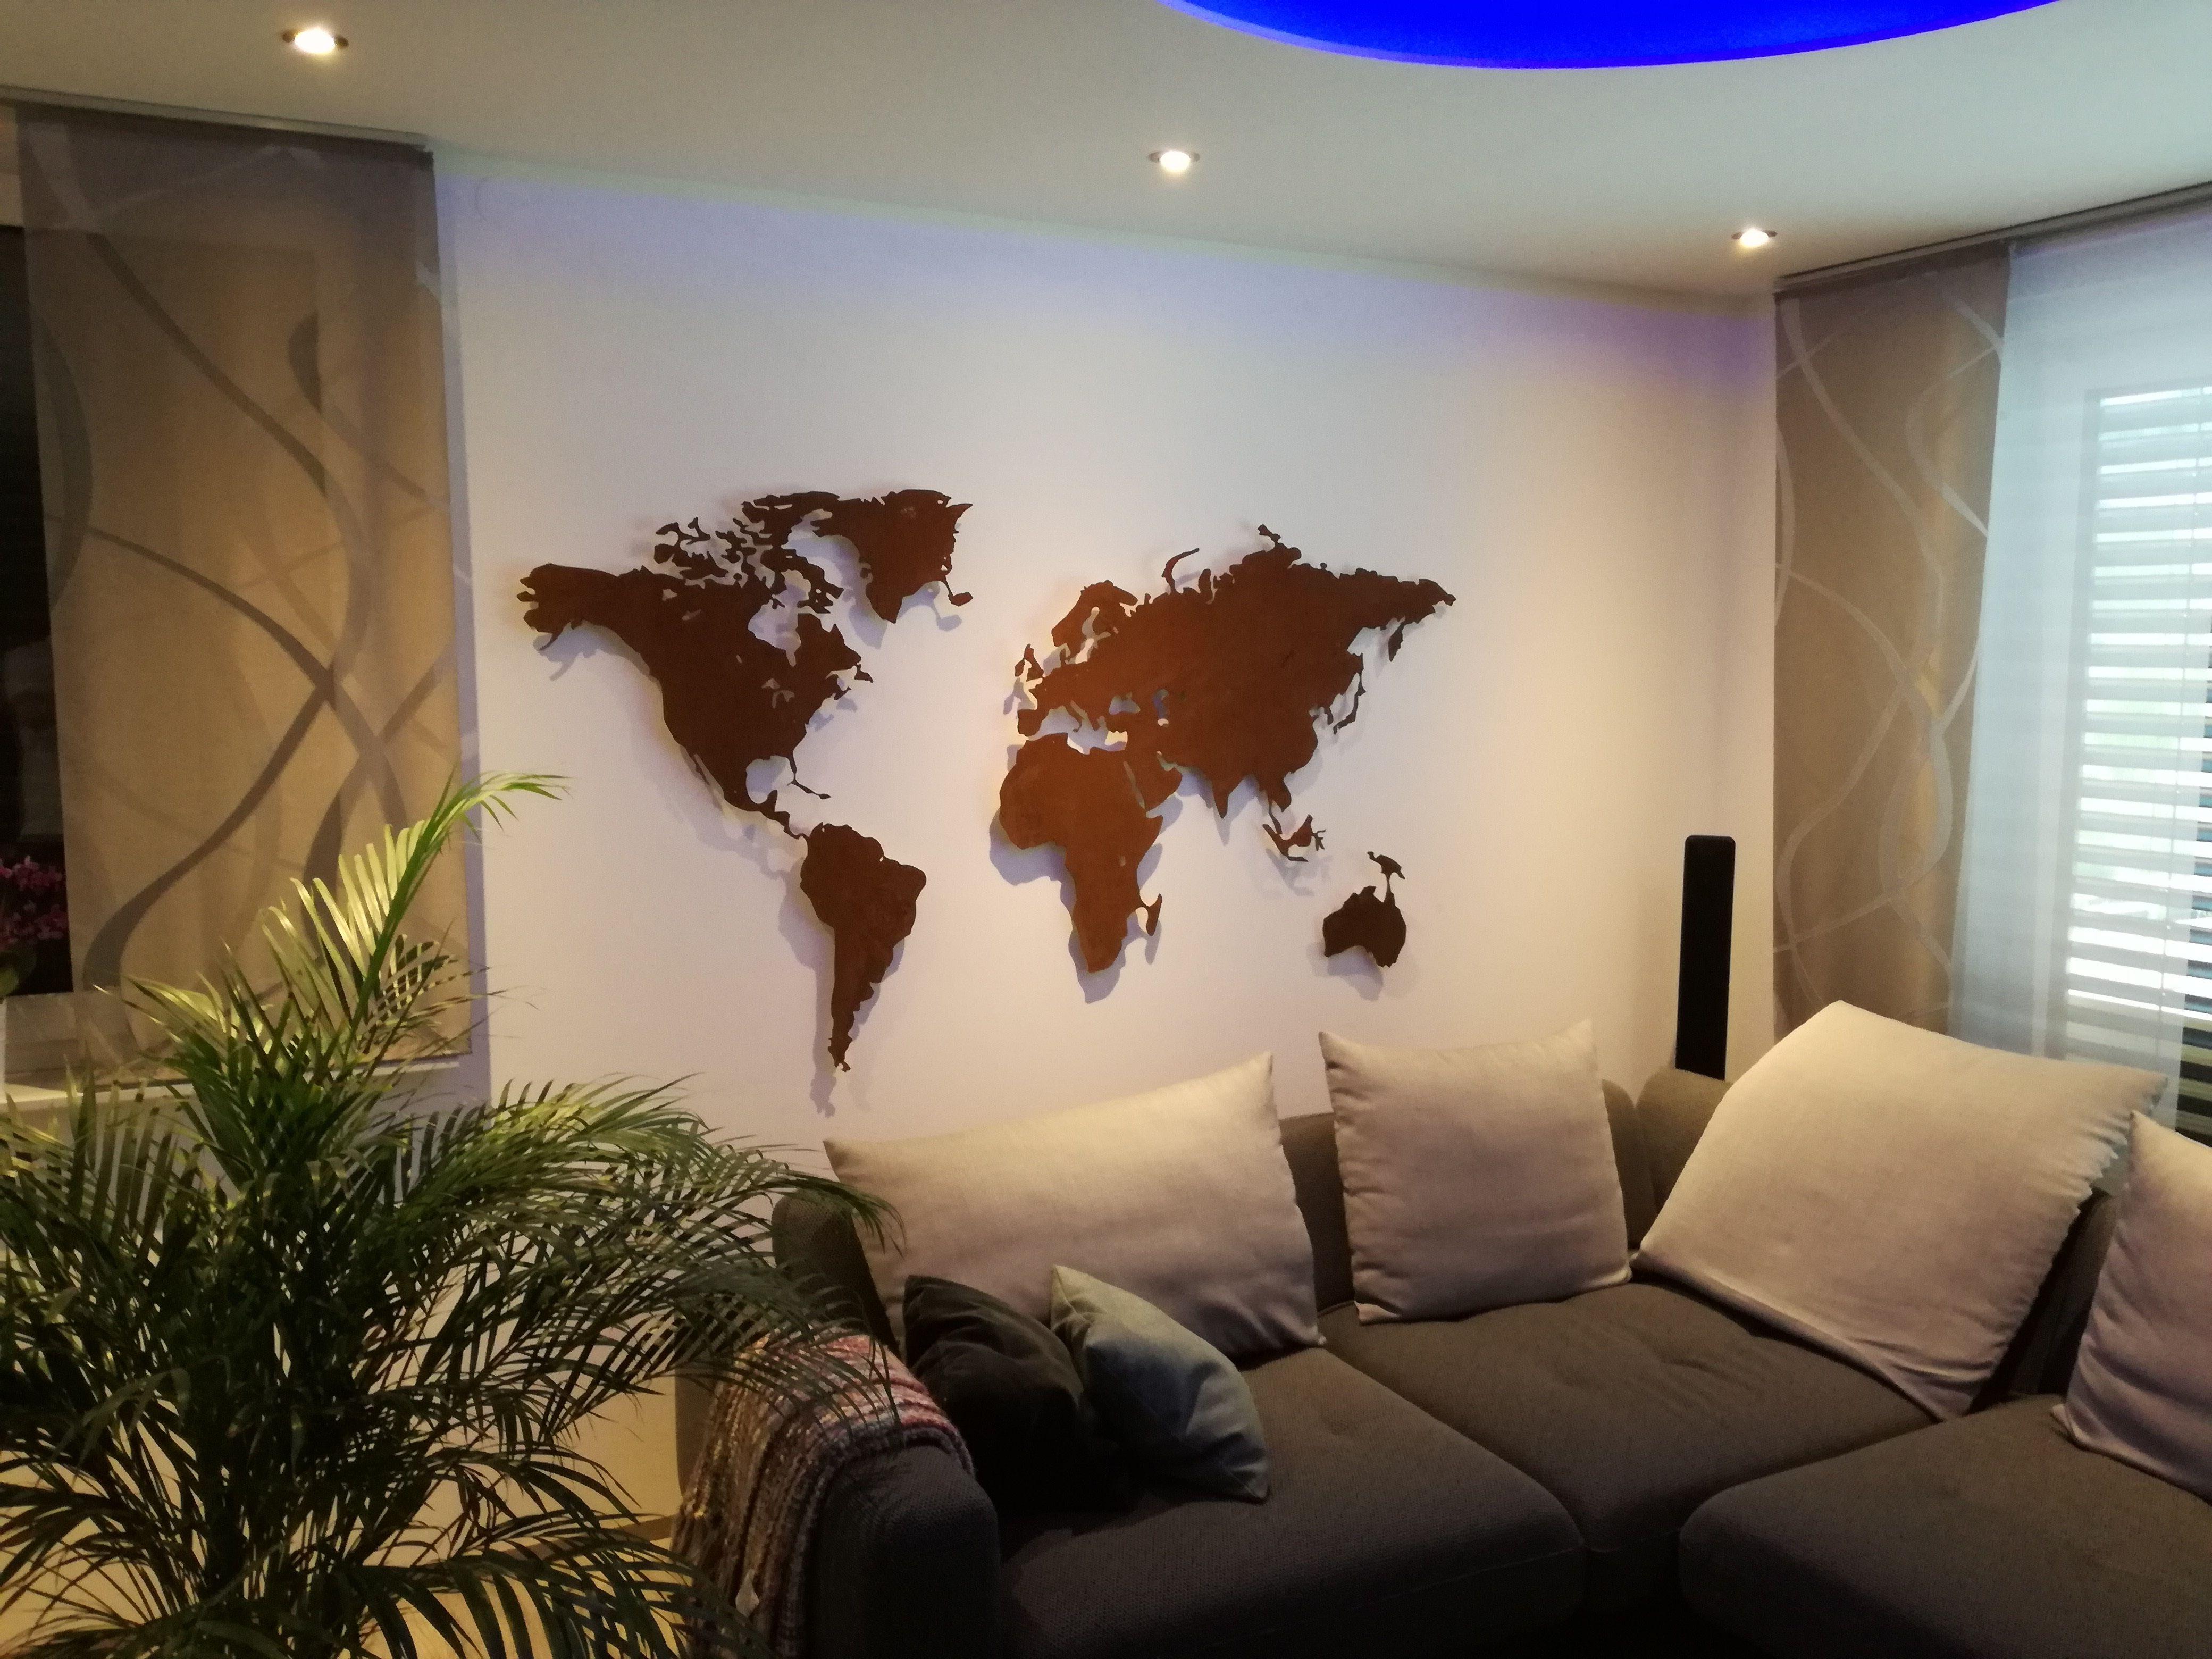 weltkarte aus stahl im rost look weltkarten f r die wand. Black Bedroom Furniture Sets. Home Design Ideas